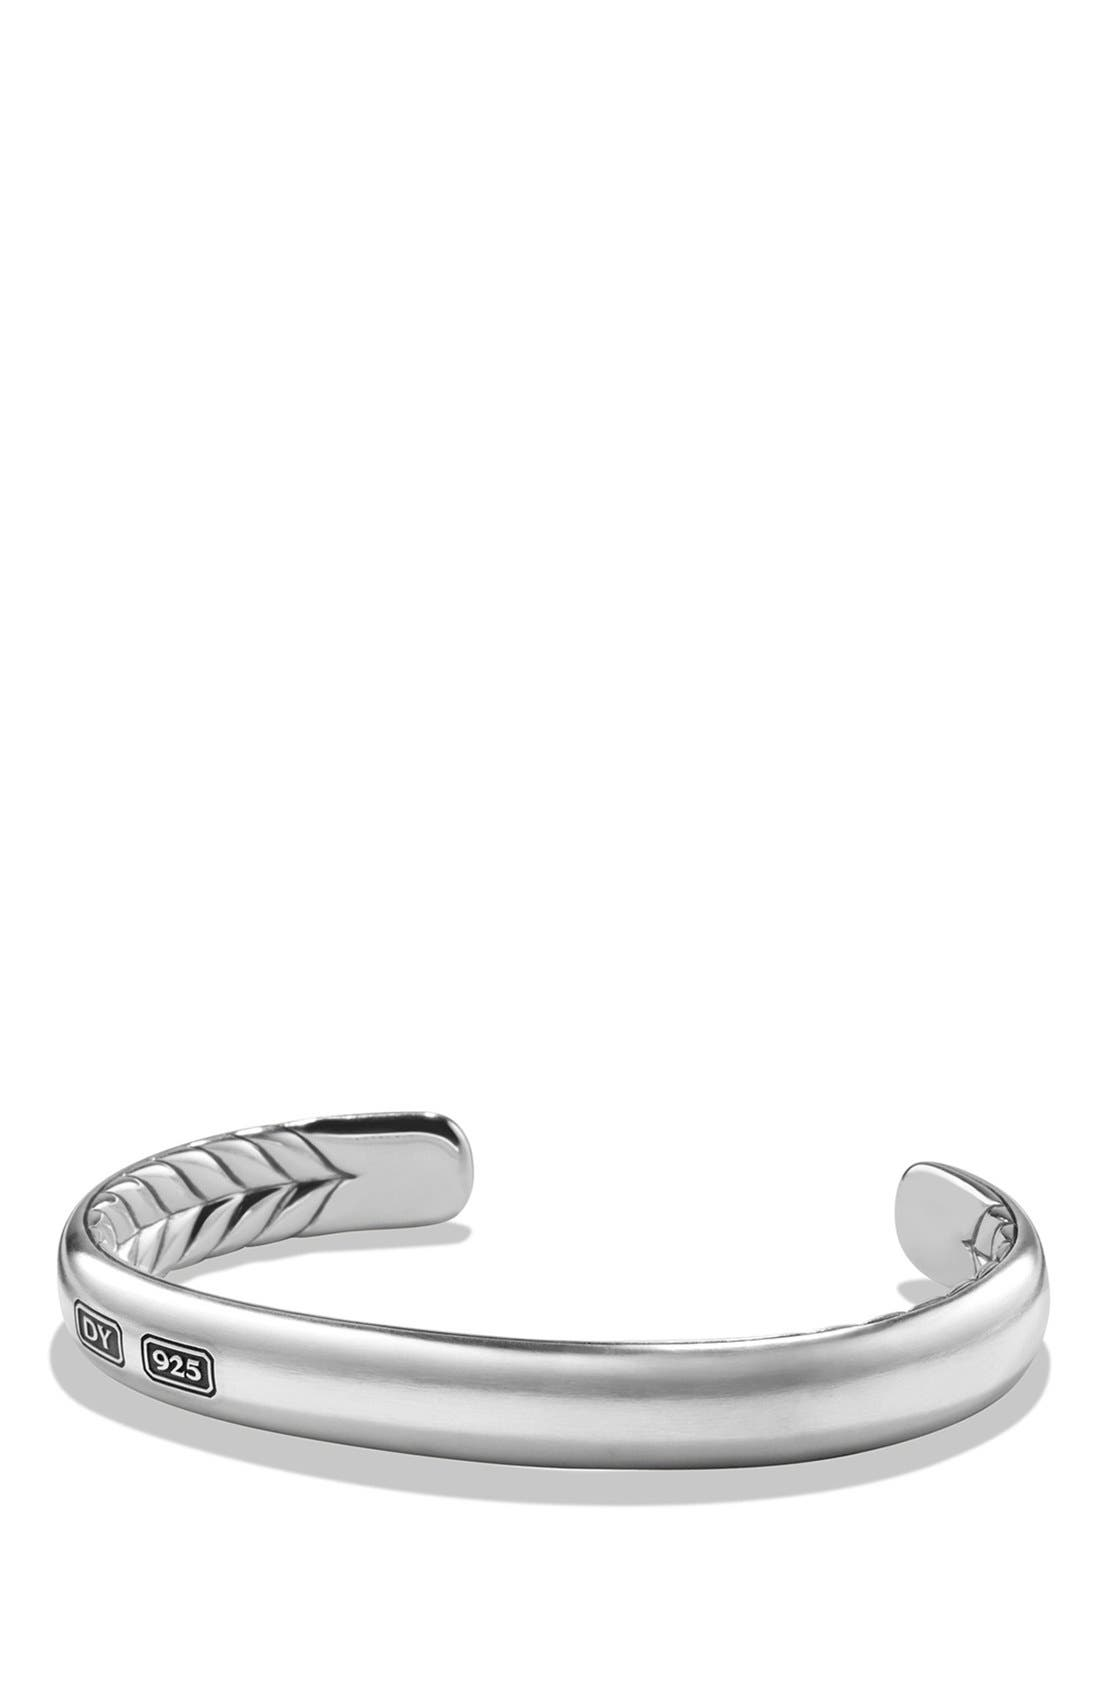 Main Image - David Yurman 'Streamline' Cuff Bracelet